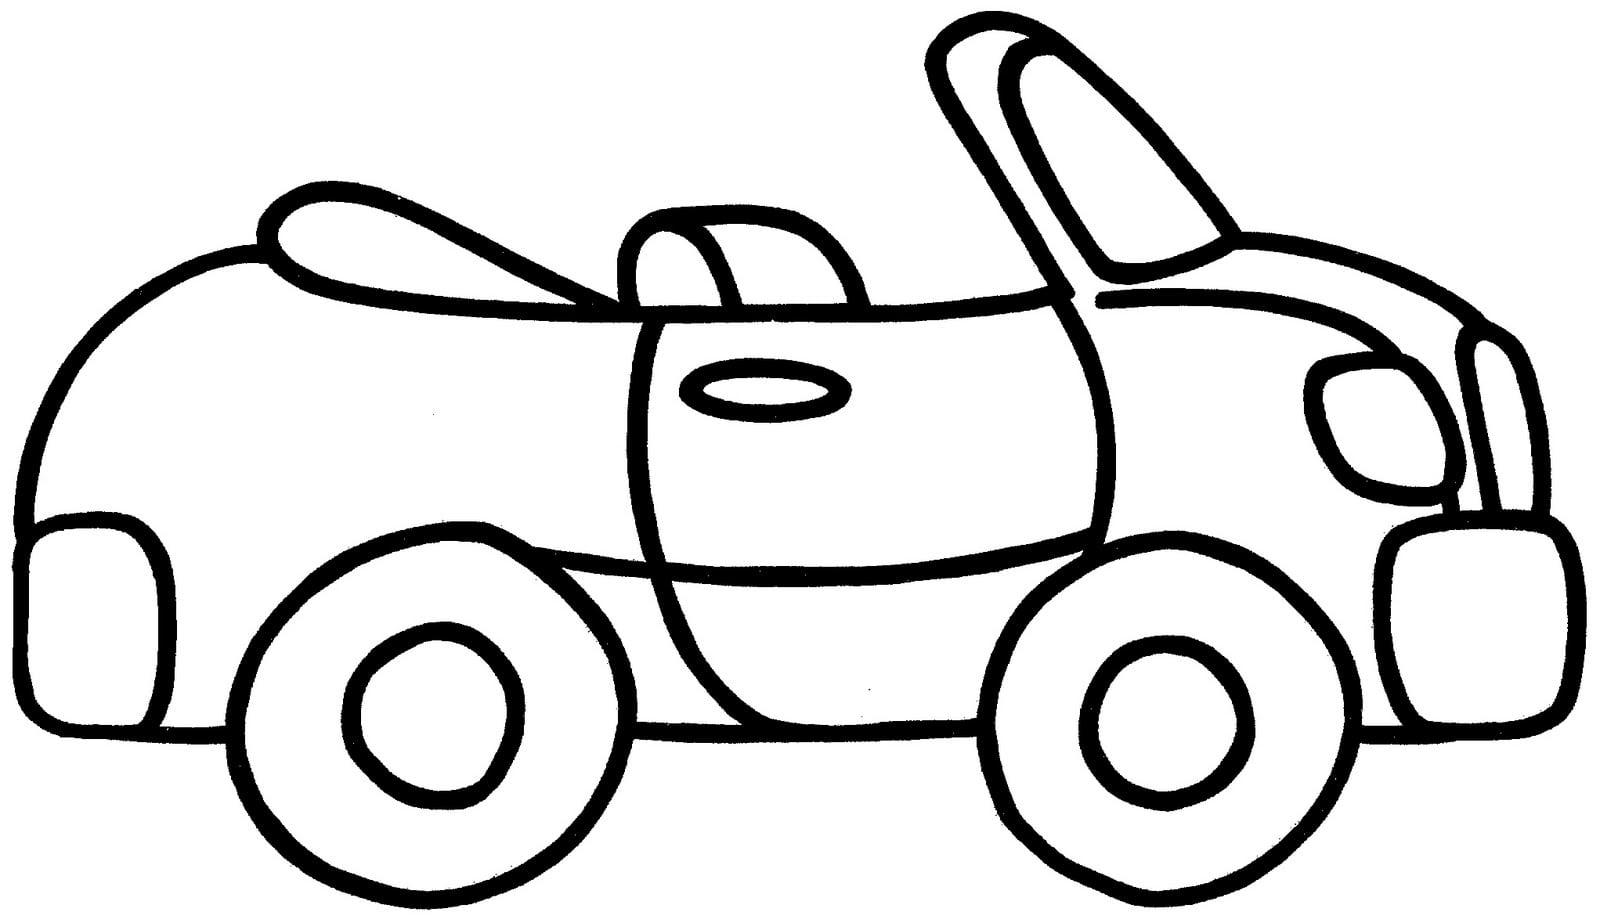 Riscos Graciosos (cute Drawings)  Meios De Transporte (means Of